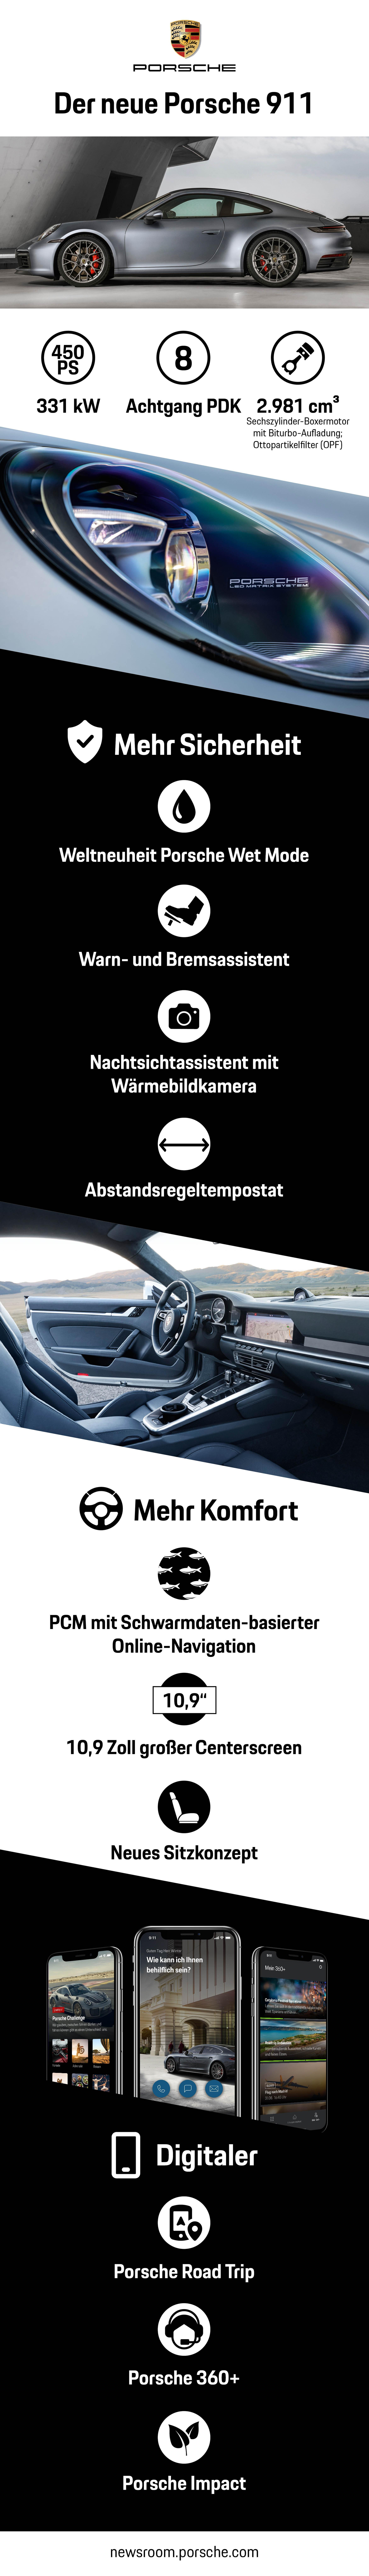 Der neue Porsche 911, Infografik, 2018, Porsche AG